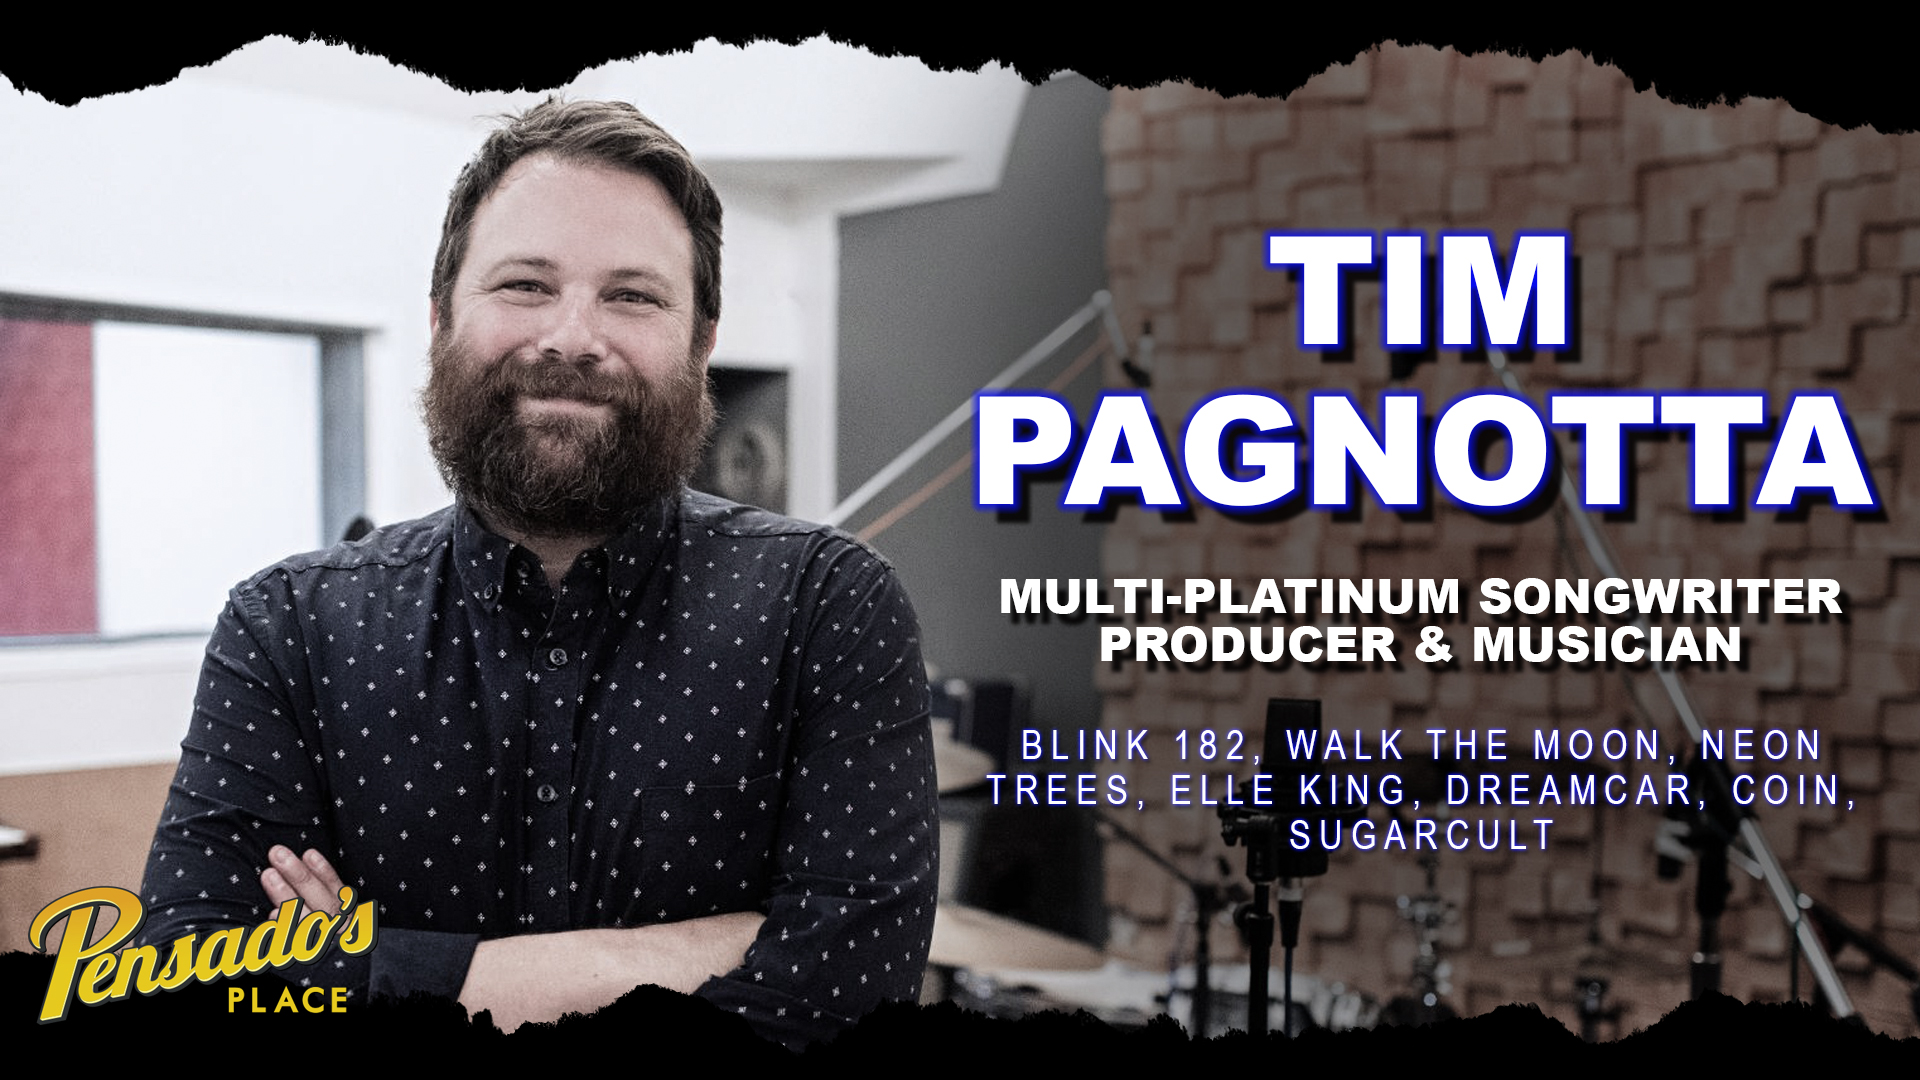 Multi-Platinum Songwriter / Producer / Musician, Tim Pagnotta